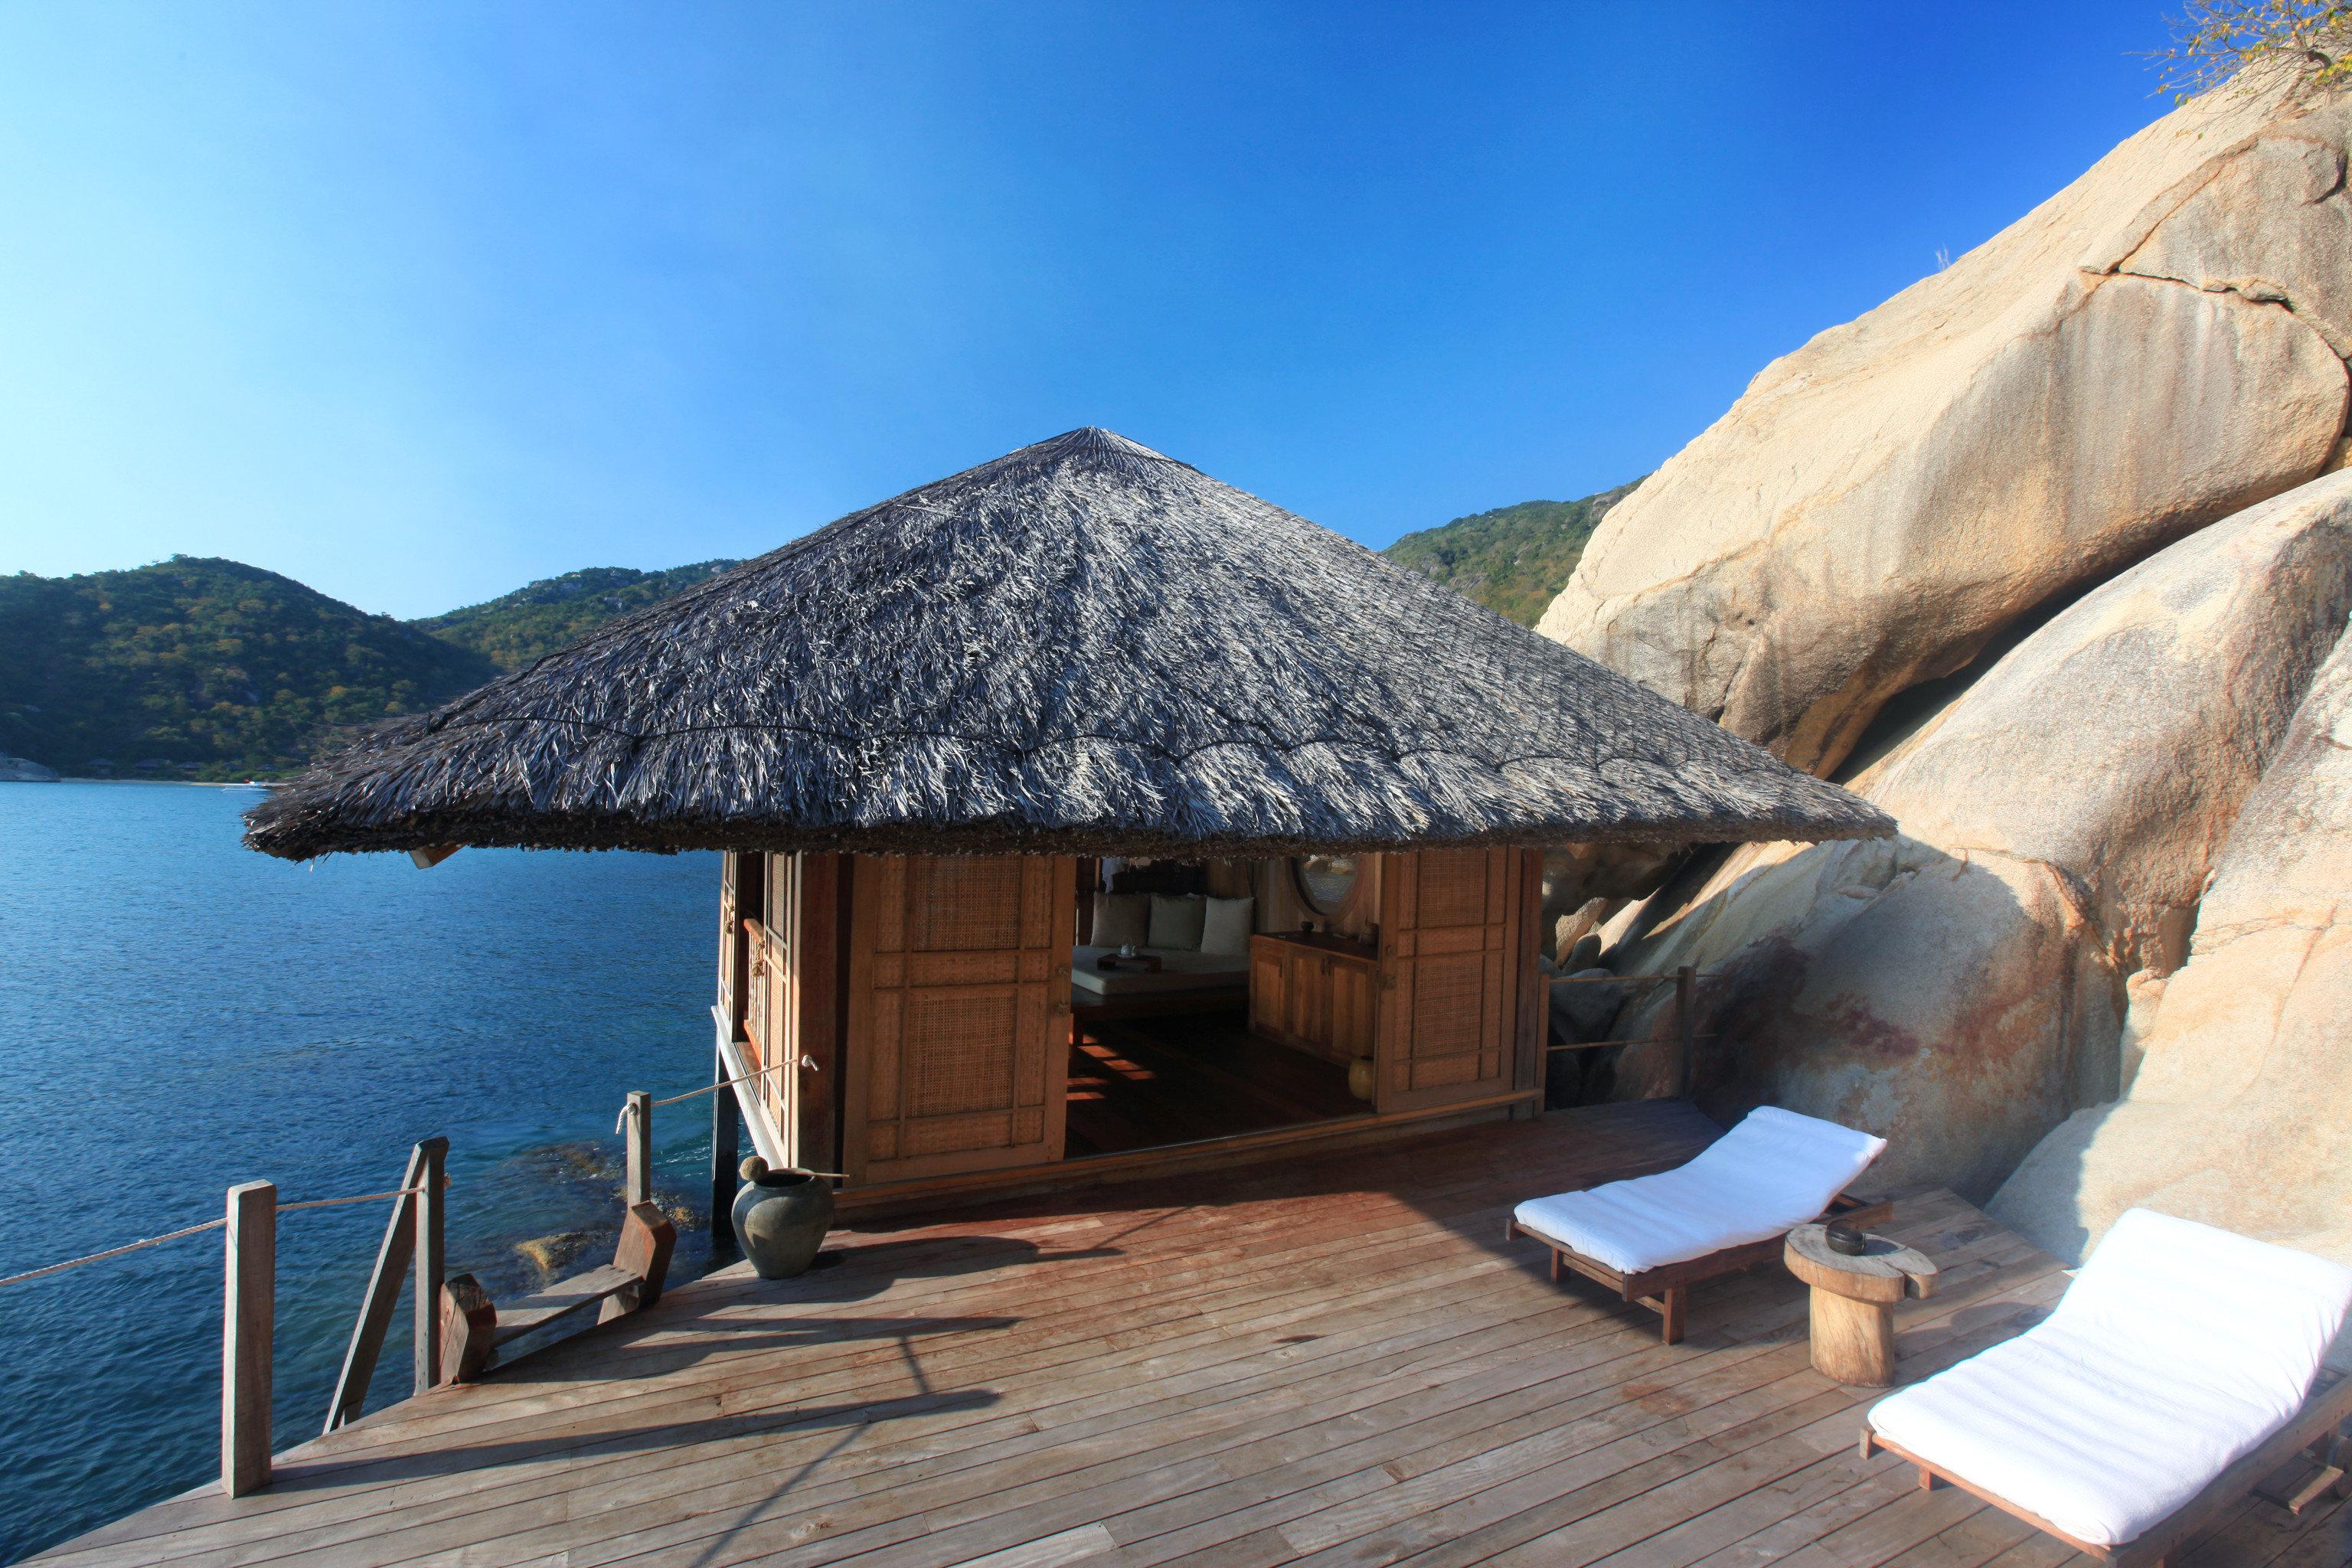 Balcony Beachfront Deck Hotels Jungle Romance Scenic views Terrace Tropical Waterfront sky mountain hut Nature Sea overlooking stone